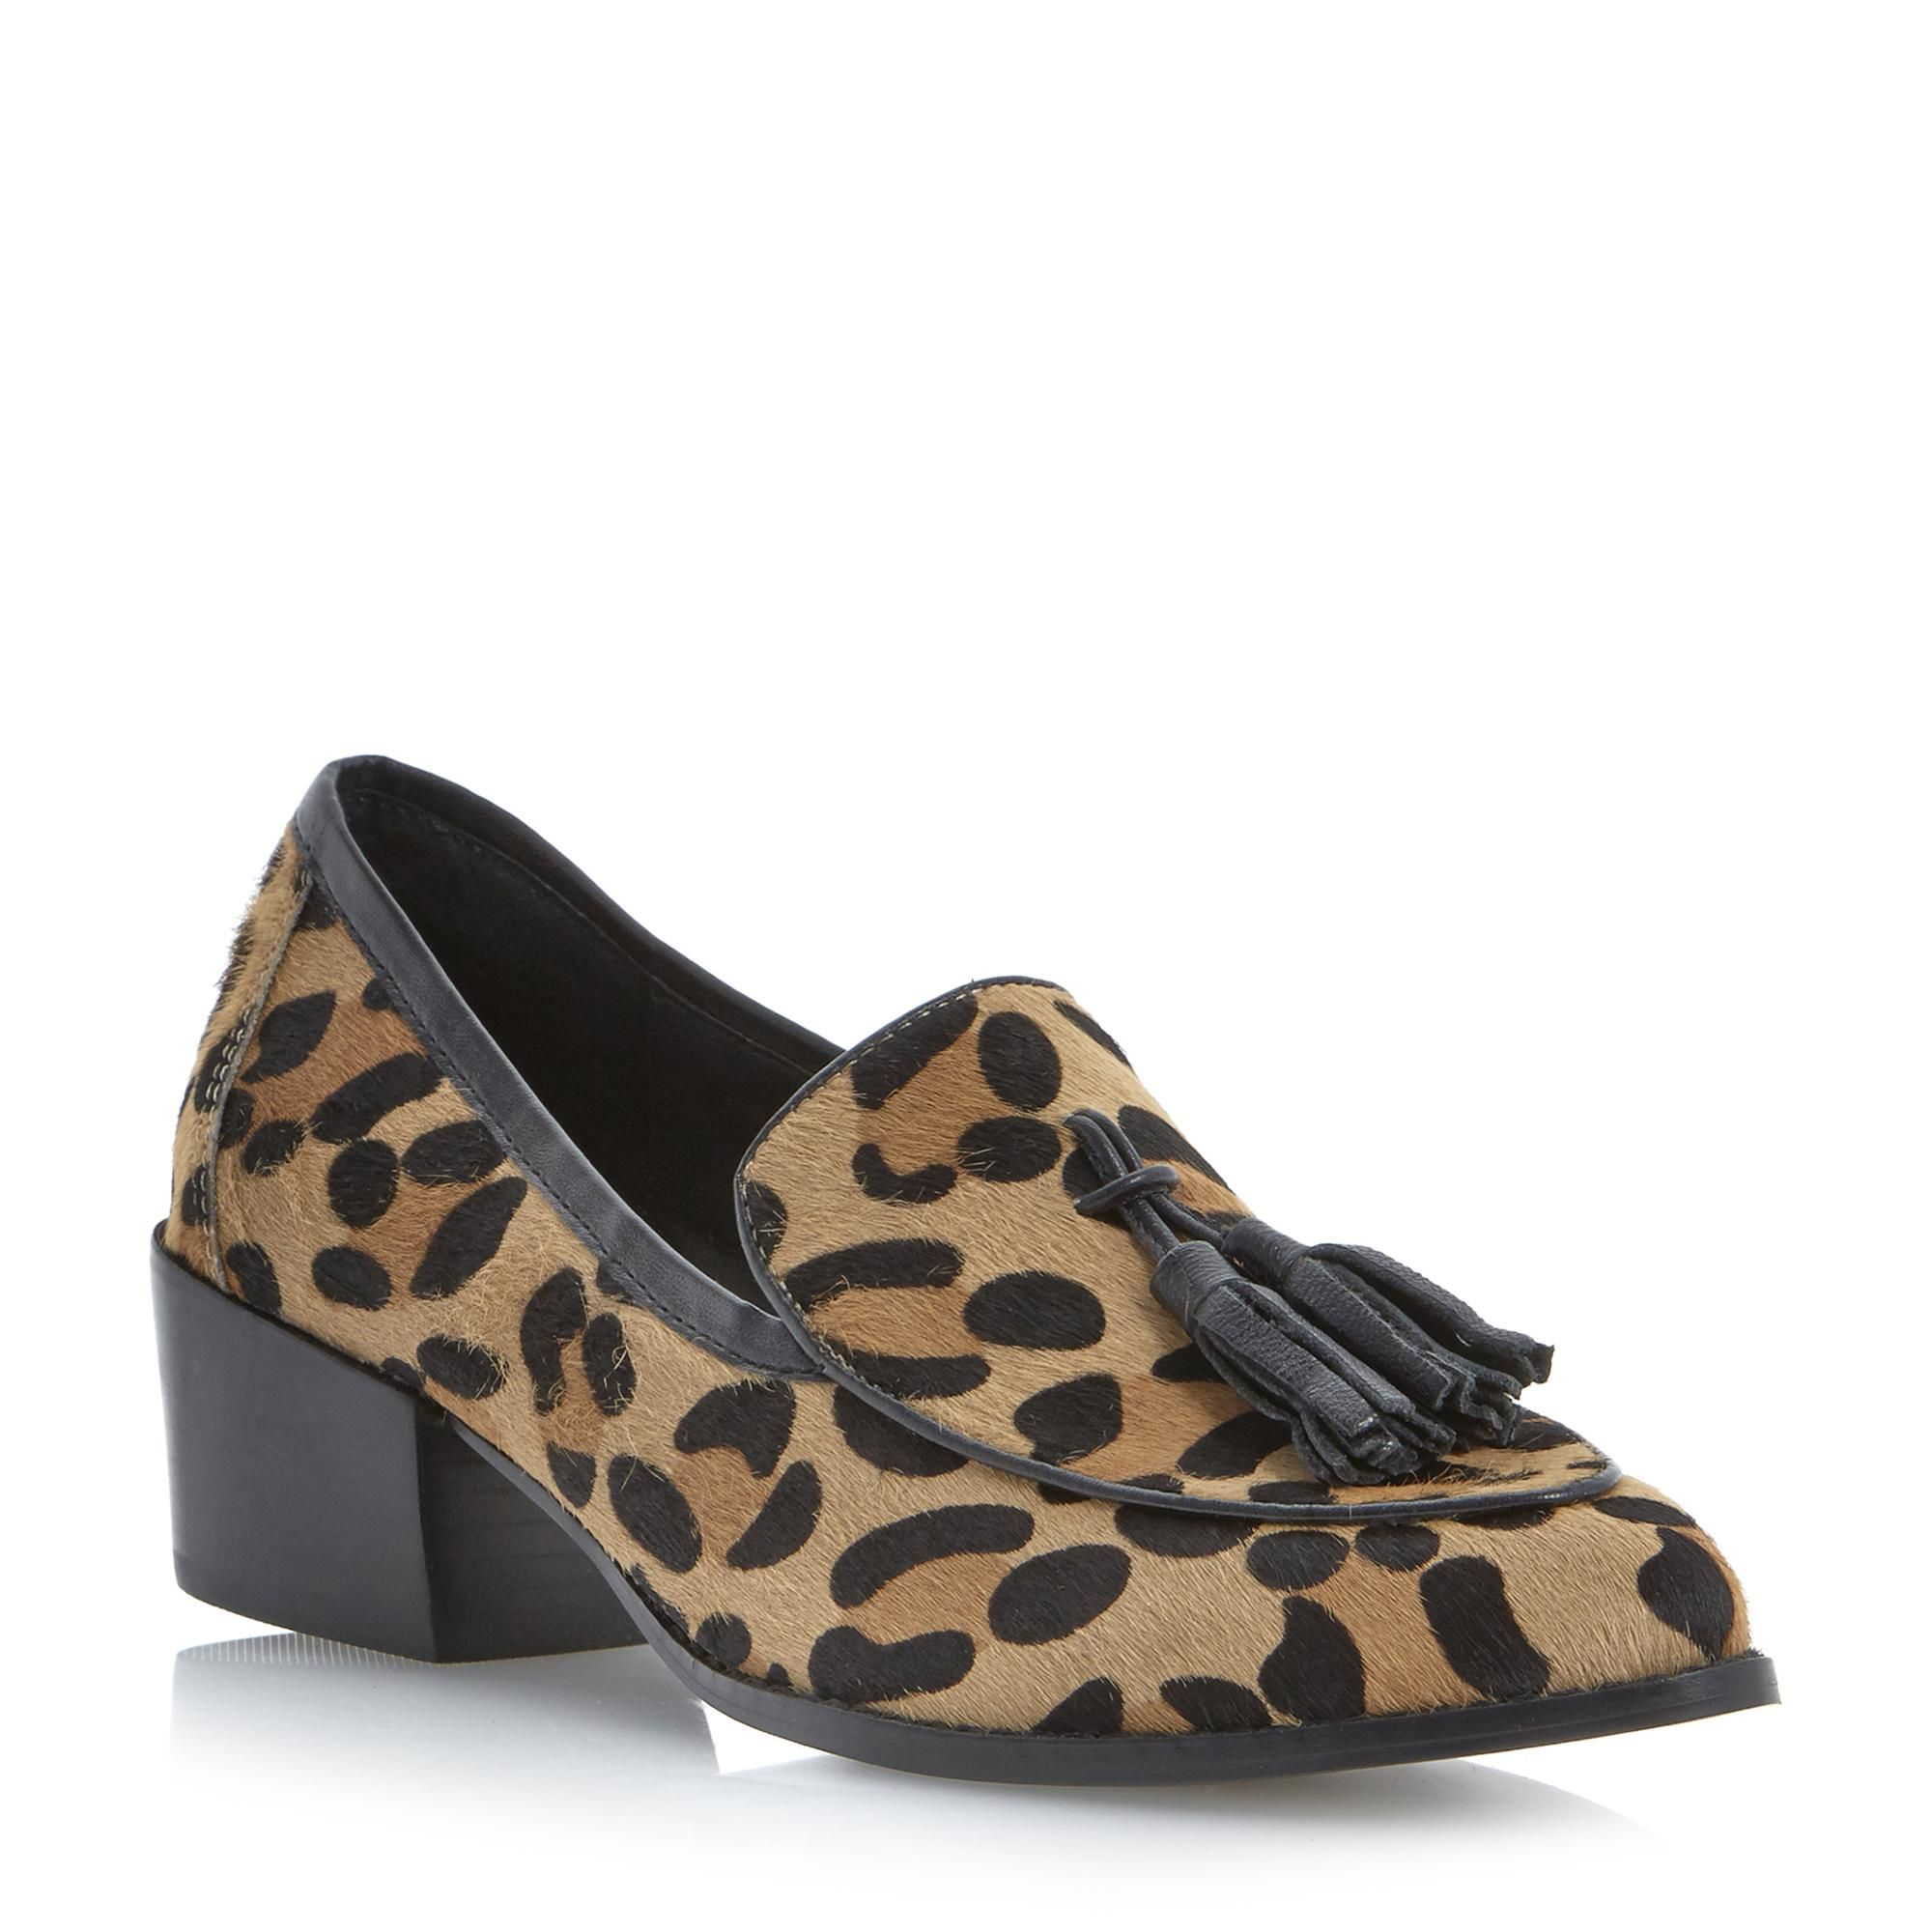 f5d52834580 STEVE MADDEN TEATIME - Pony Tassel Loafer - leopard | Dune Shoes ...